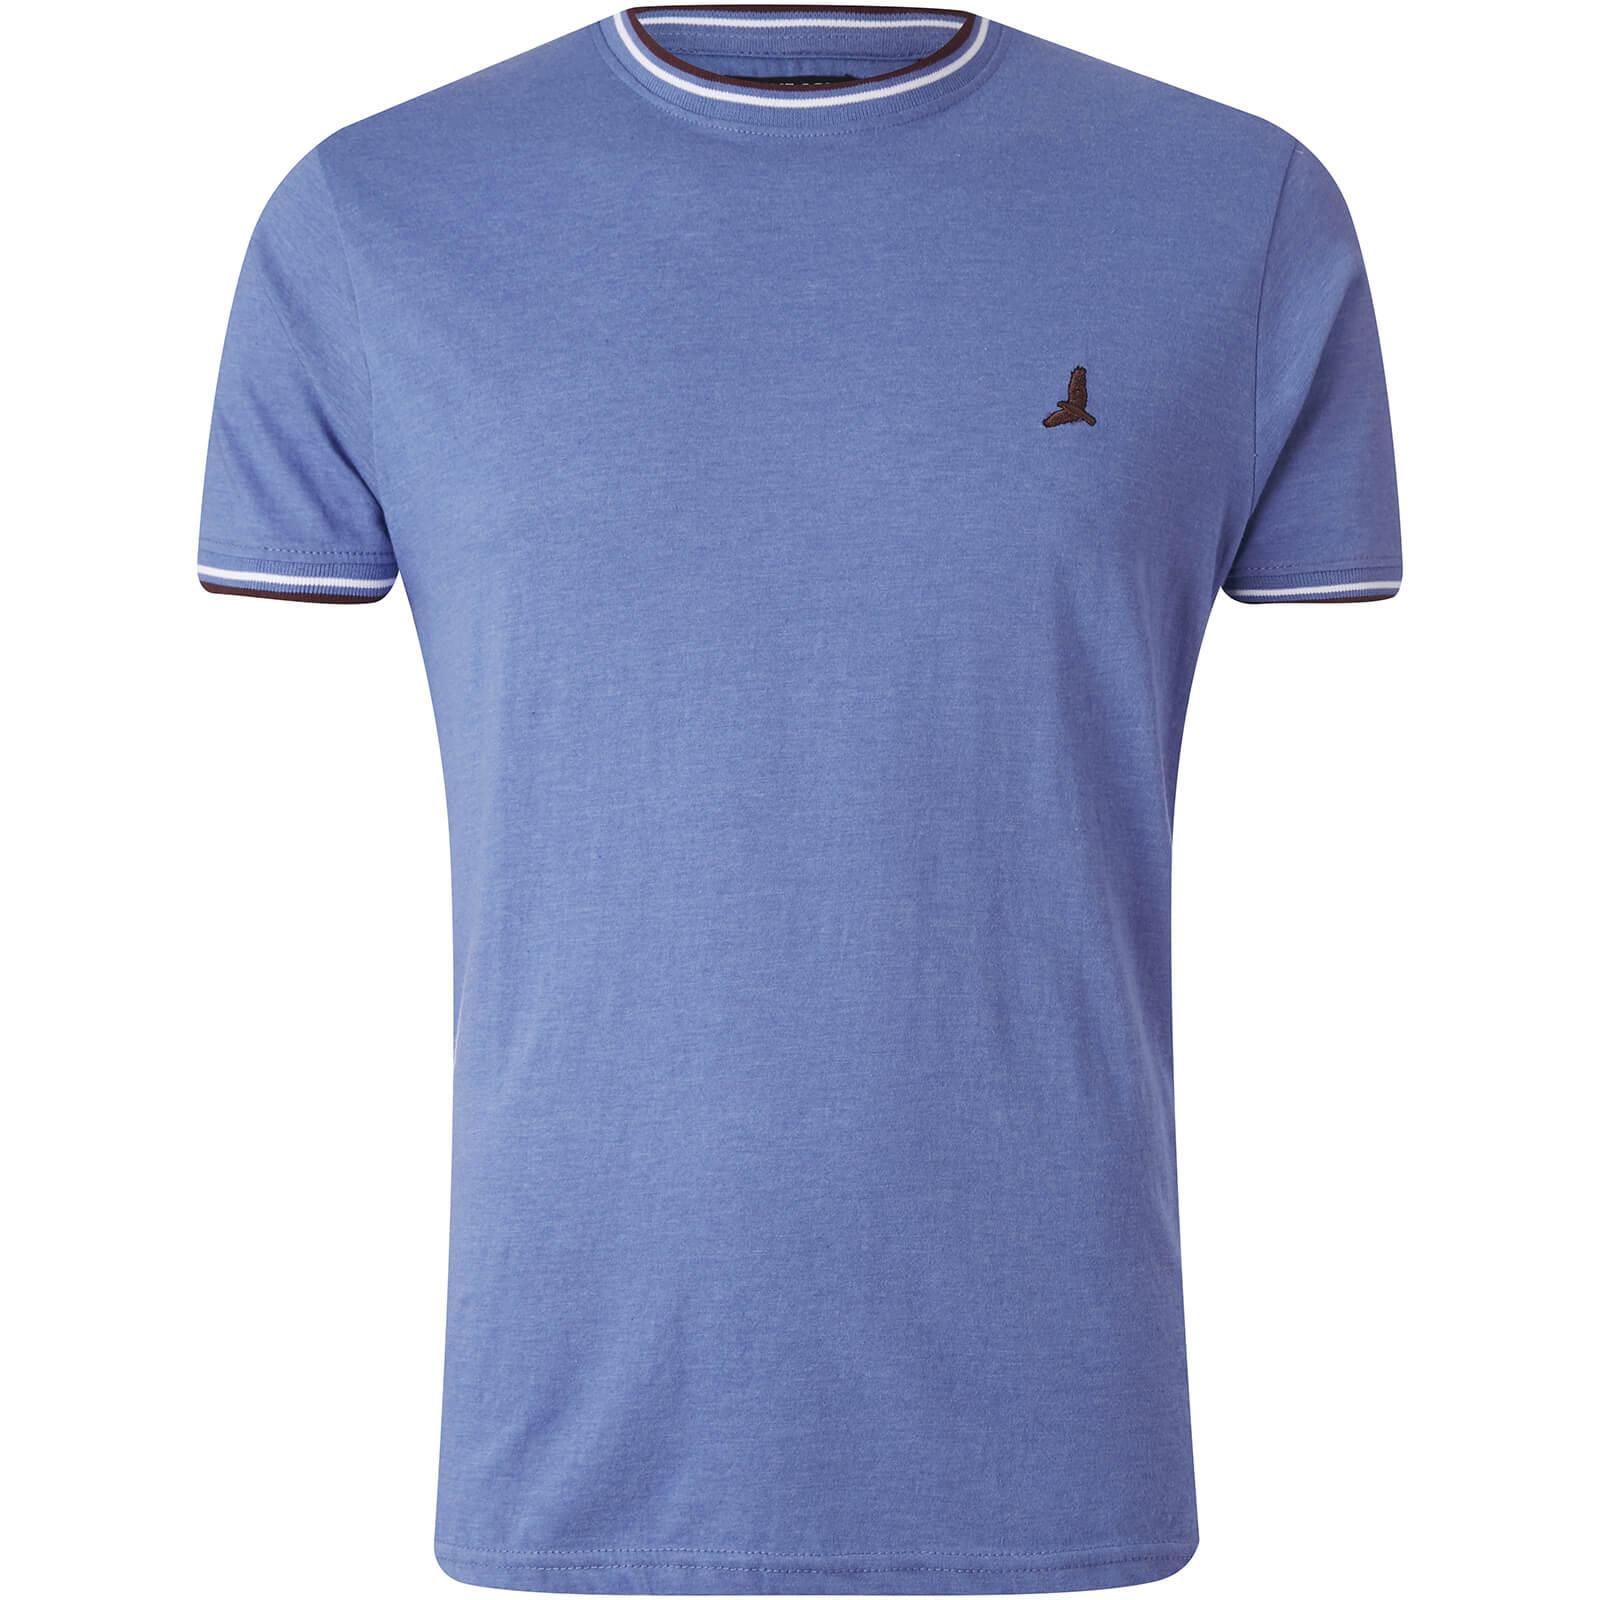 Brave Soul Men's Federer Tipped T-Shirt - Blue Marl talla S